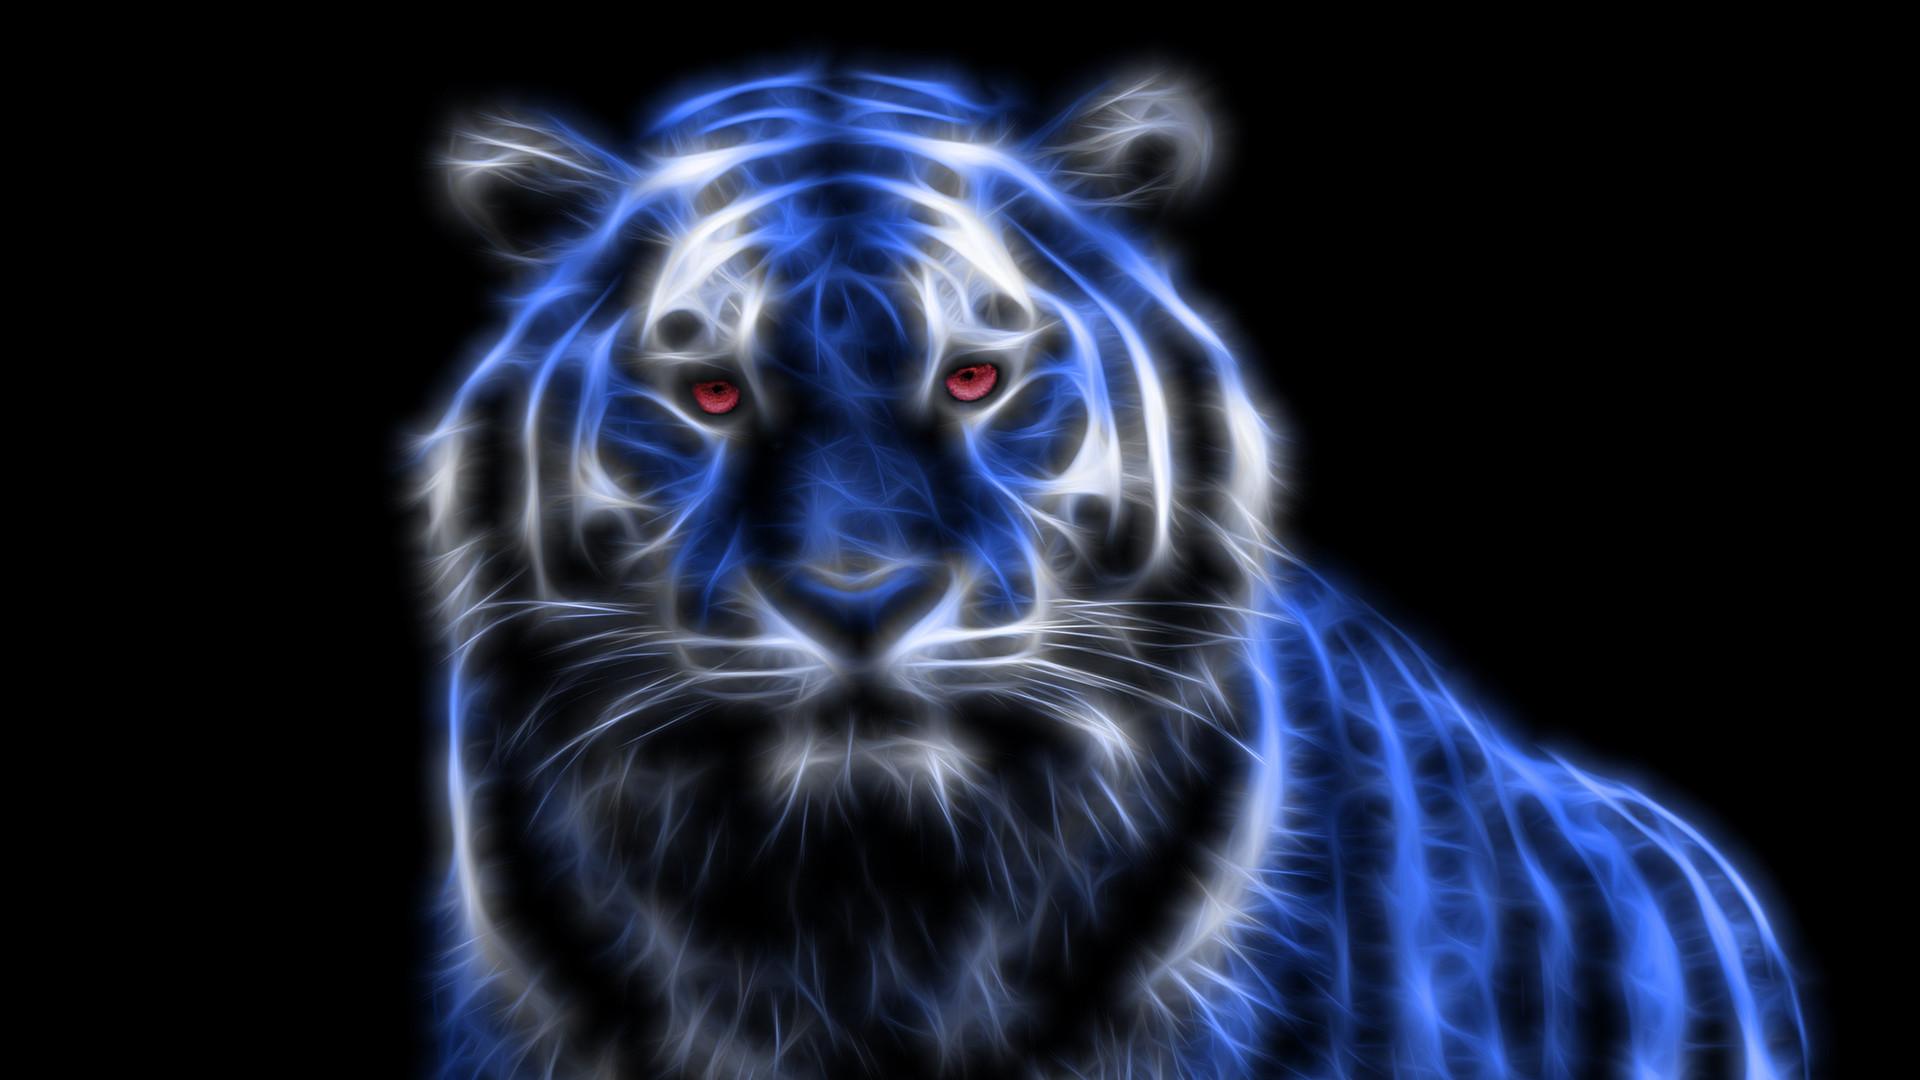 Neon tiger wallpaper – photo#10